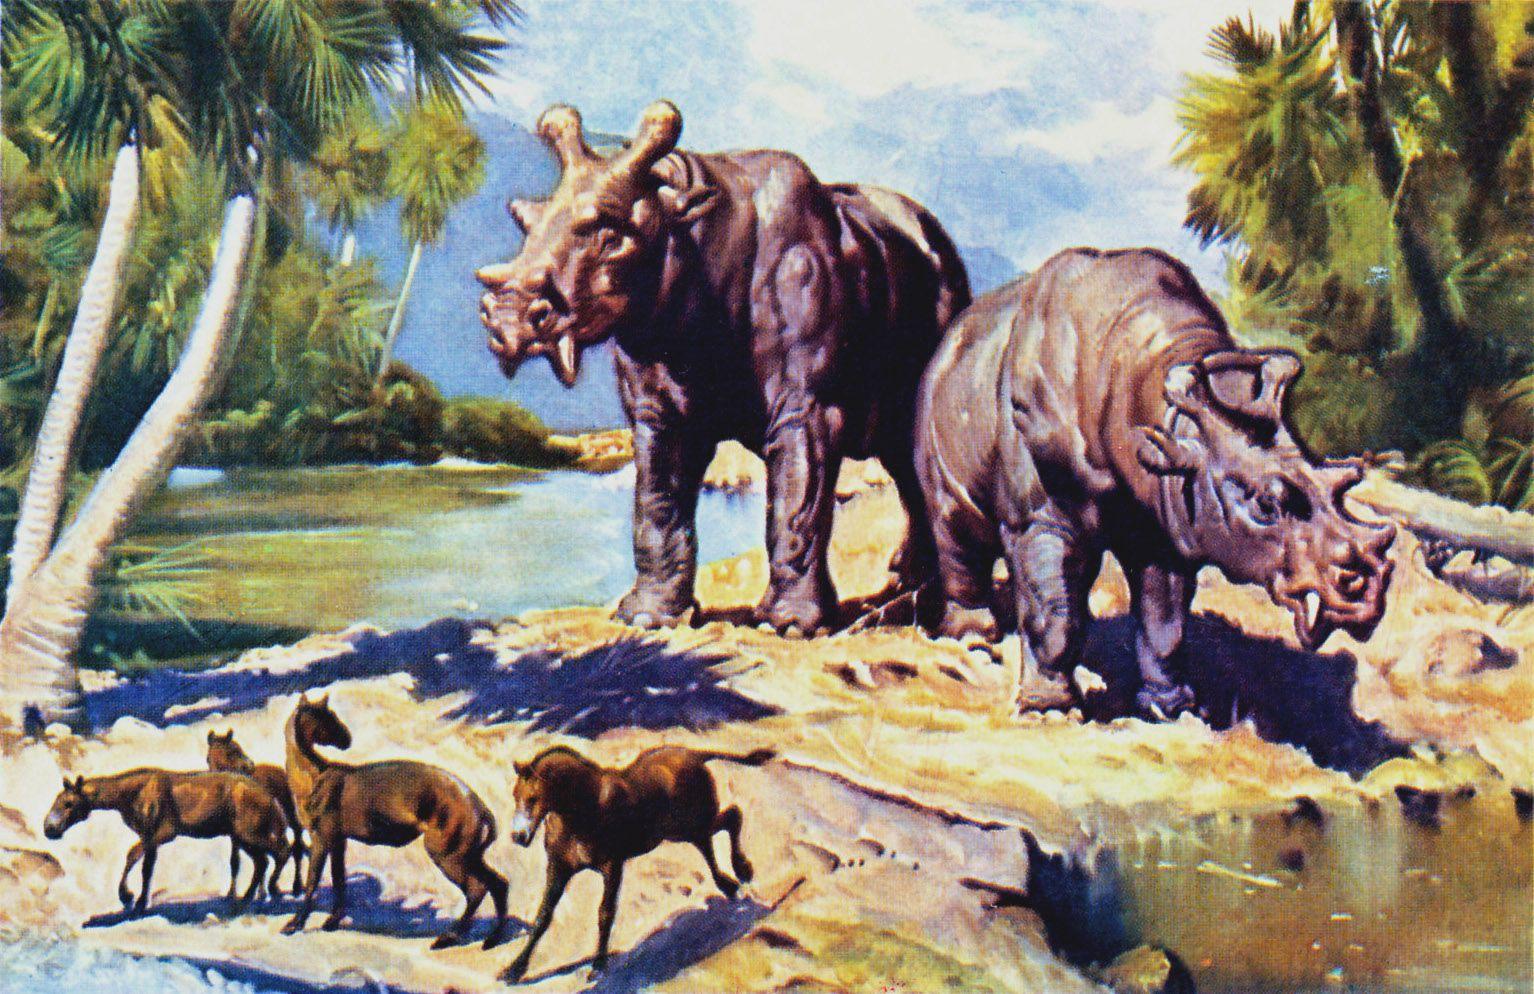 giant animals north america - HD1534×994